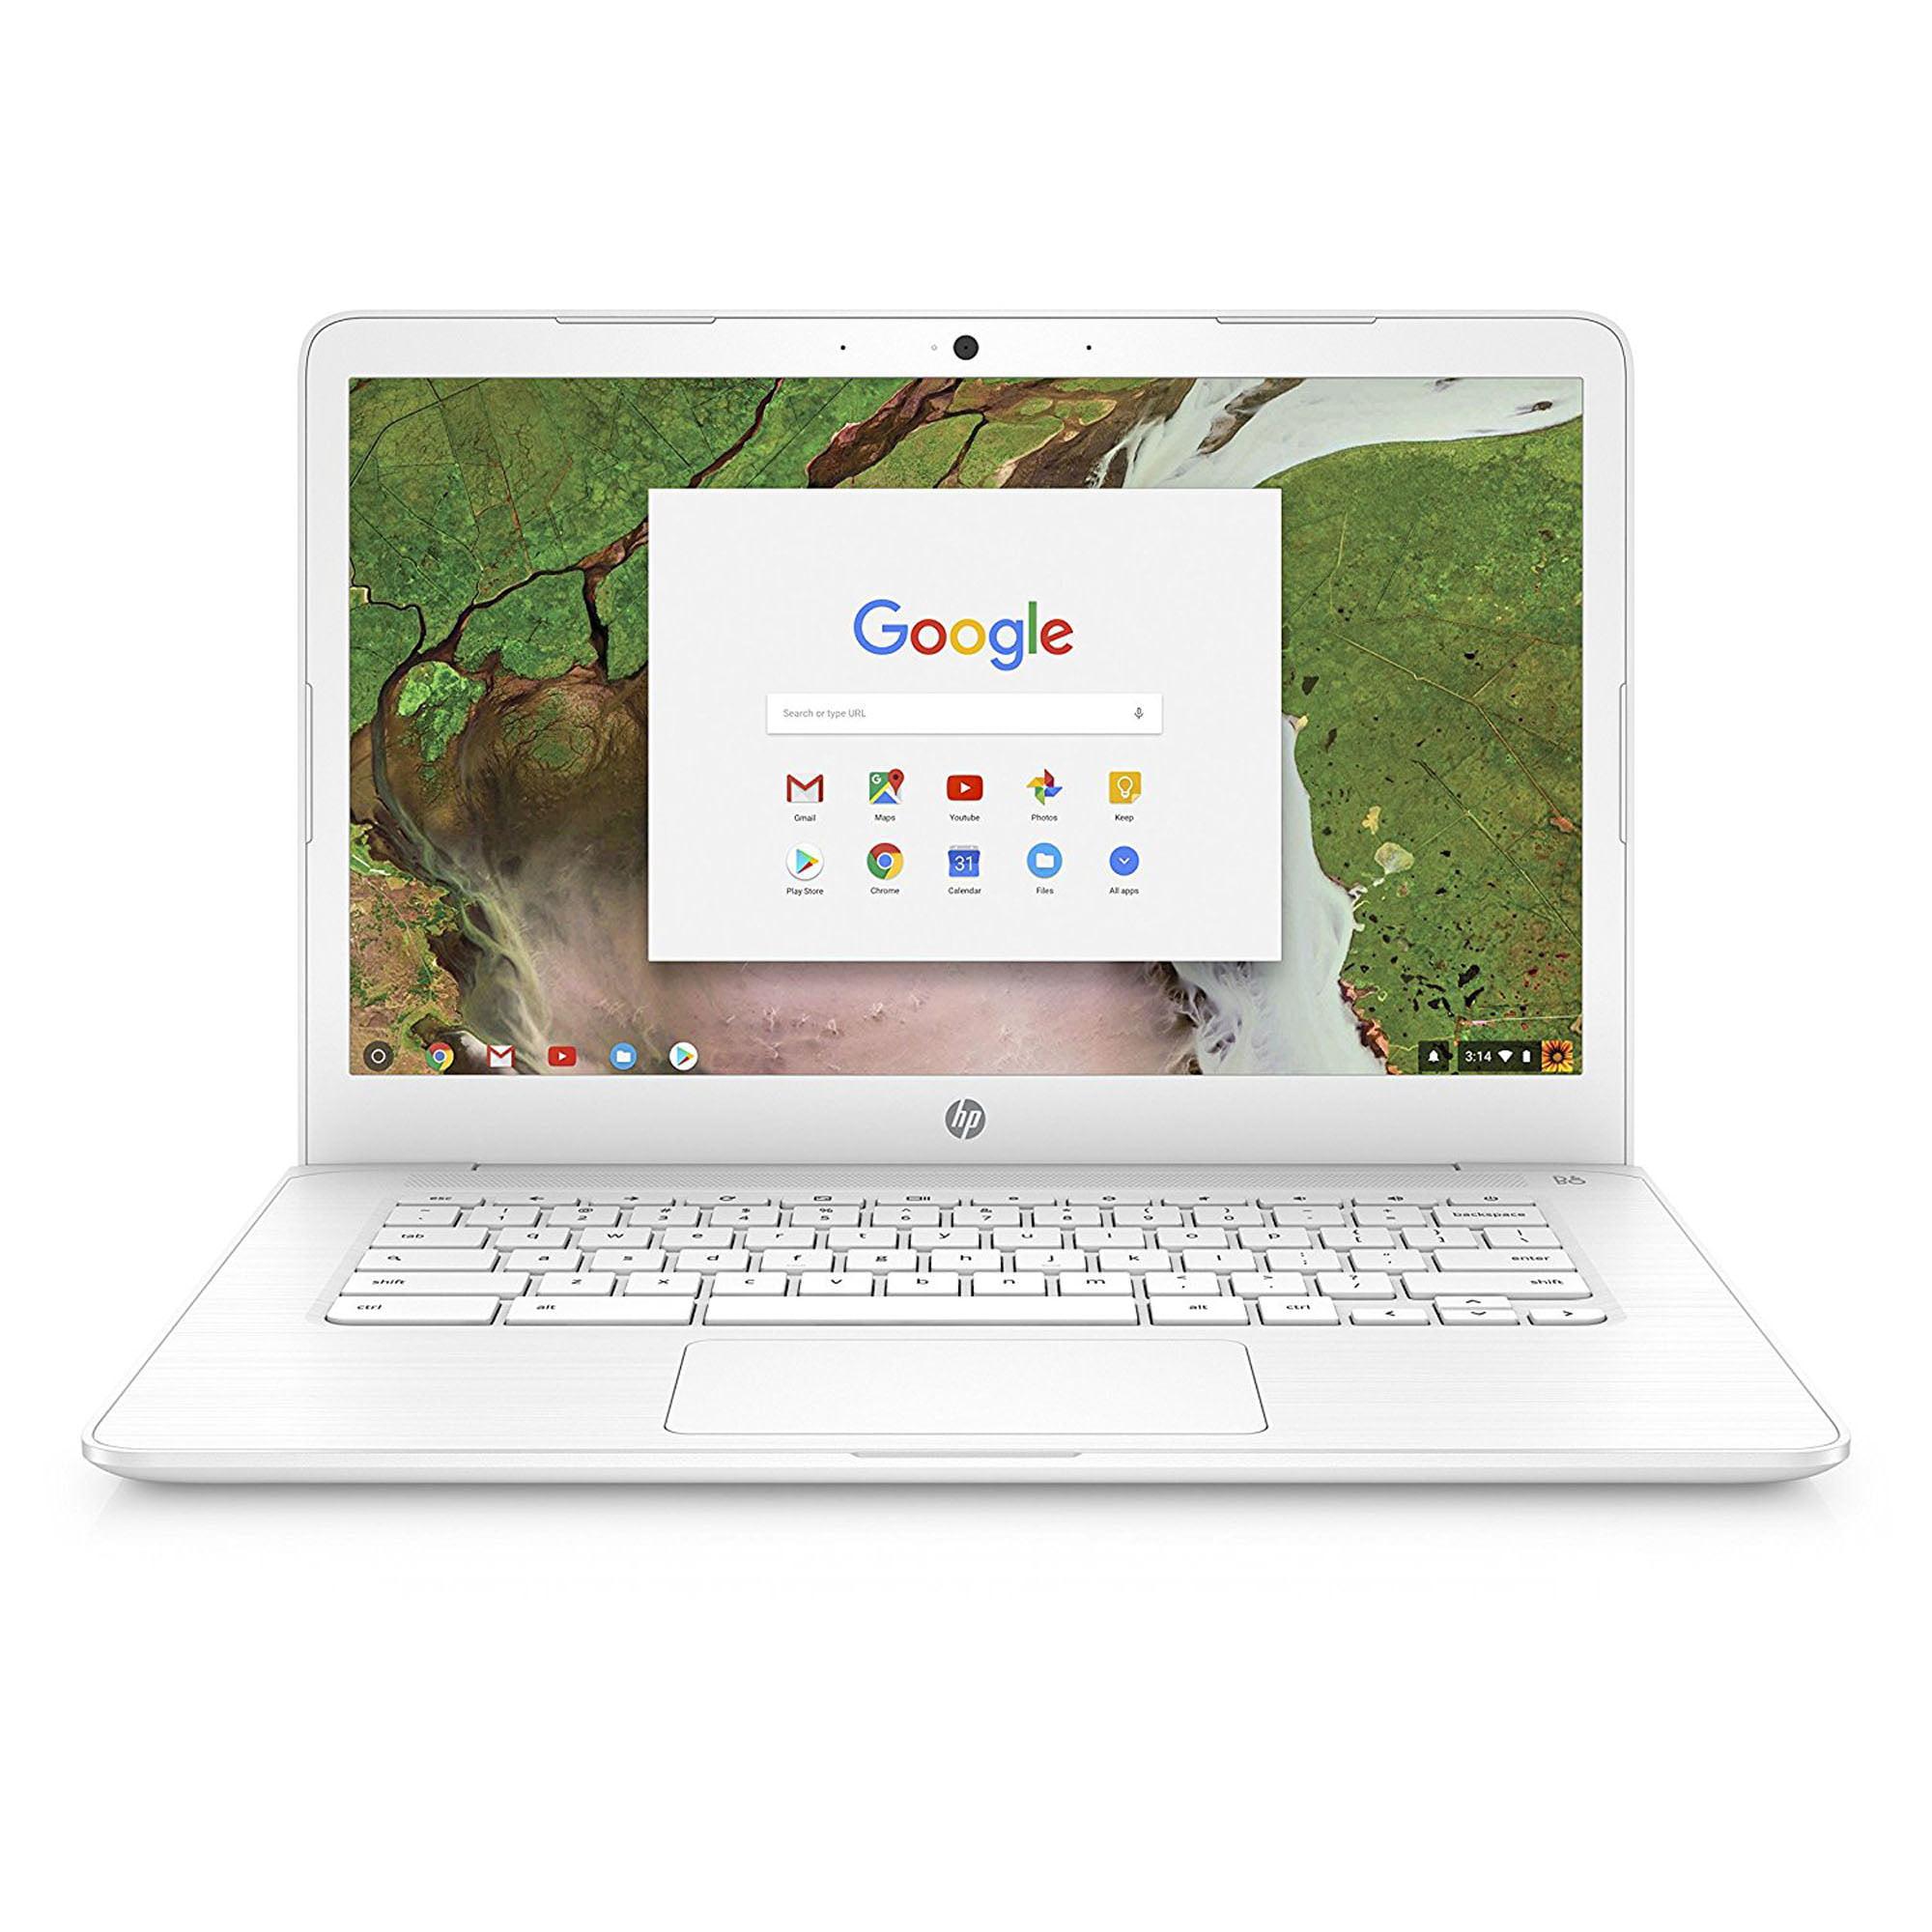 HP 14-CA070NR Chalkboard Gray 14 inch HD Touch Chromebook, Chrome OS, Celeron N3350 DC Processor, 4GB Memory, 32GB eMMC Storage, UMA graphics, B&O Play